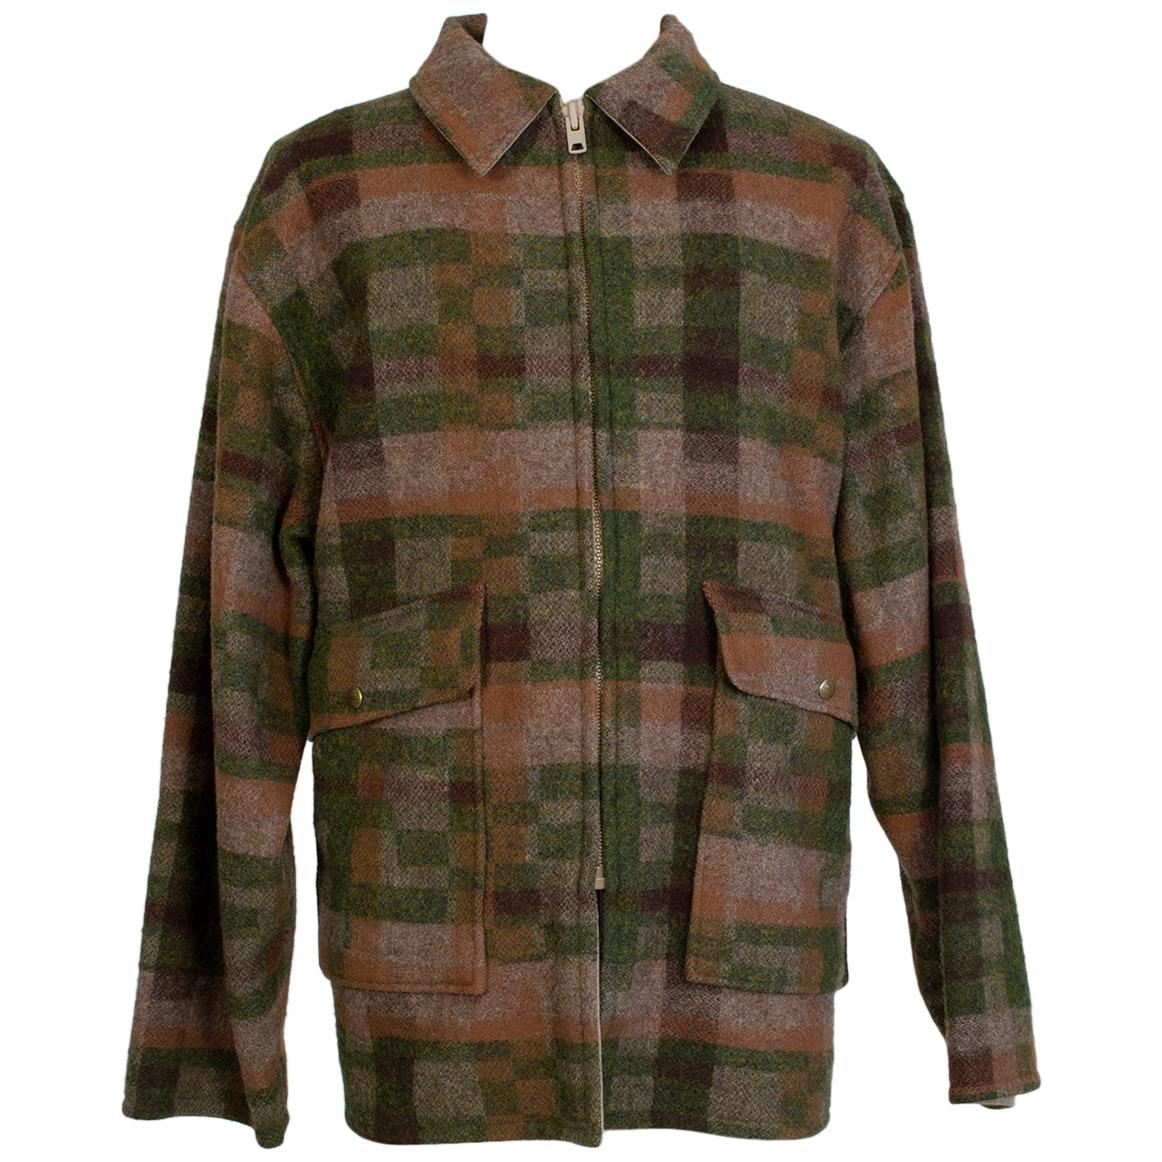 Men's LL Bean Reversible Plaid Field Jacket, 1980s